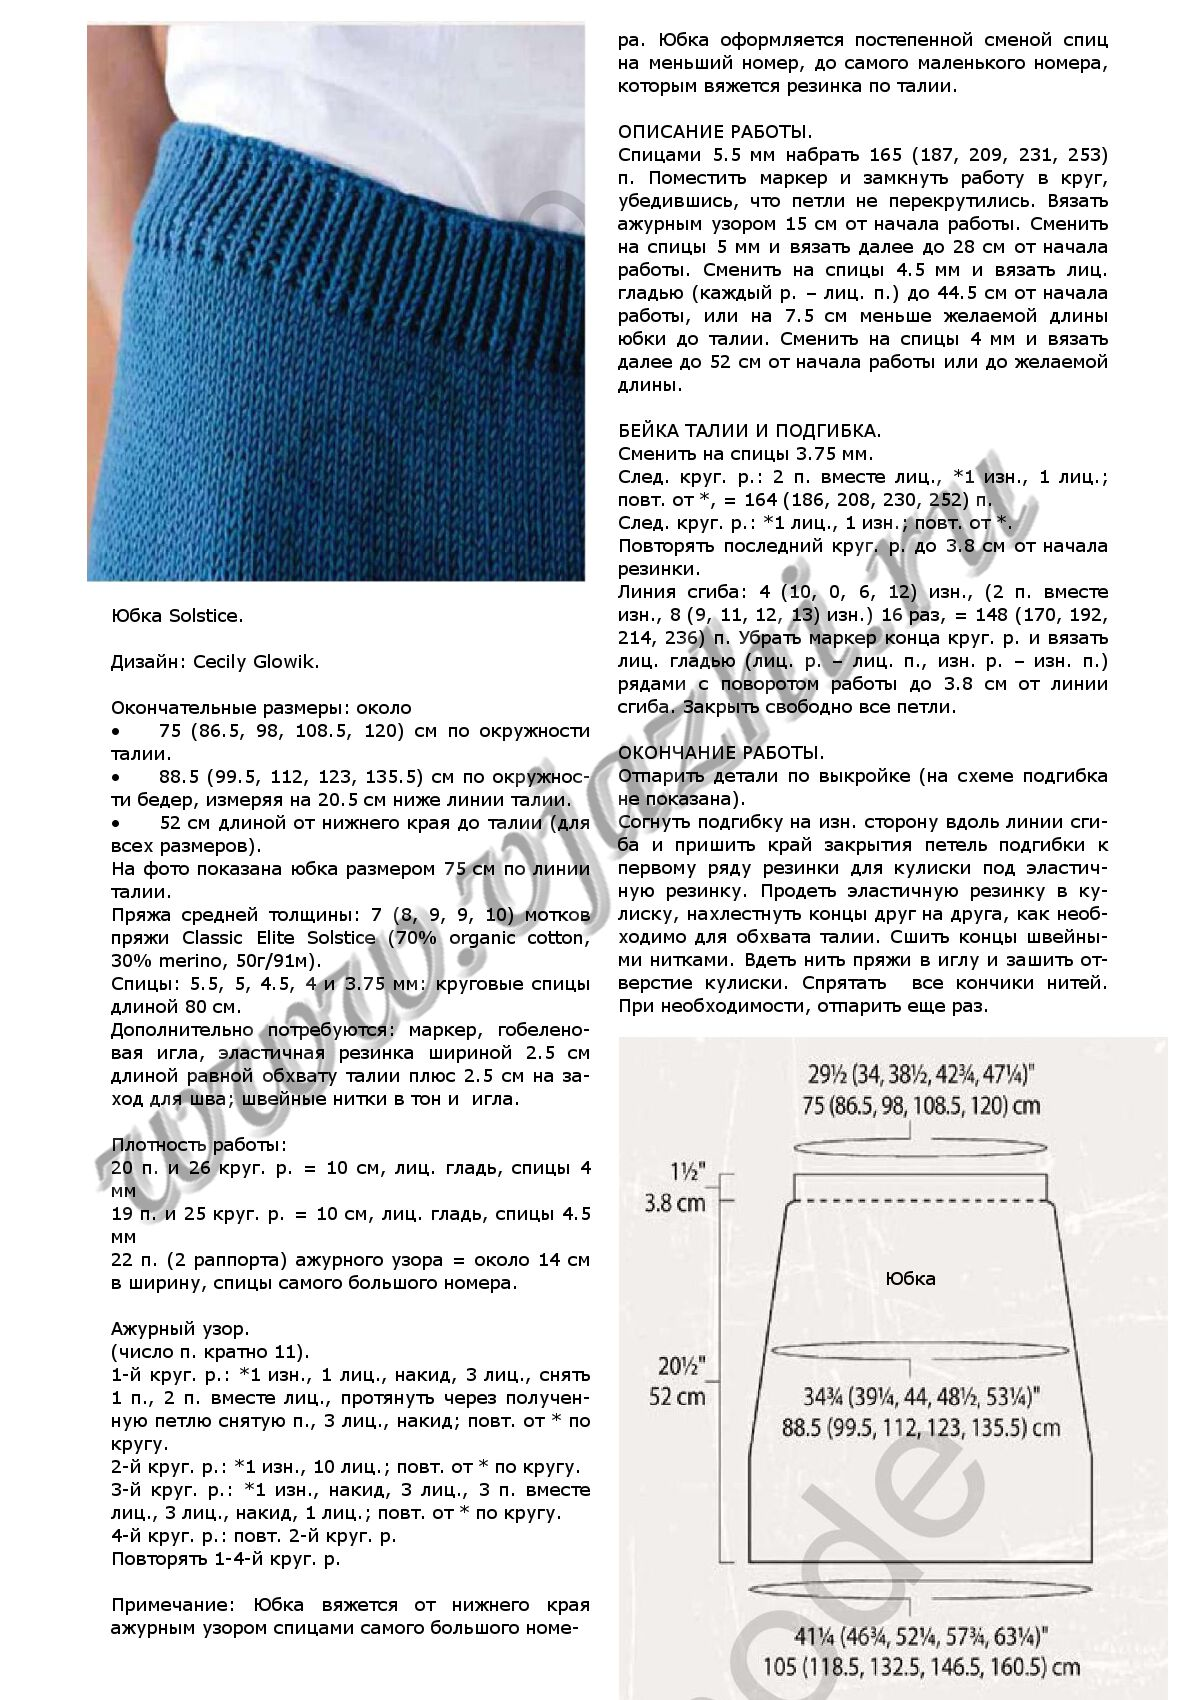 Схема вязания резинки для юбки